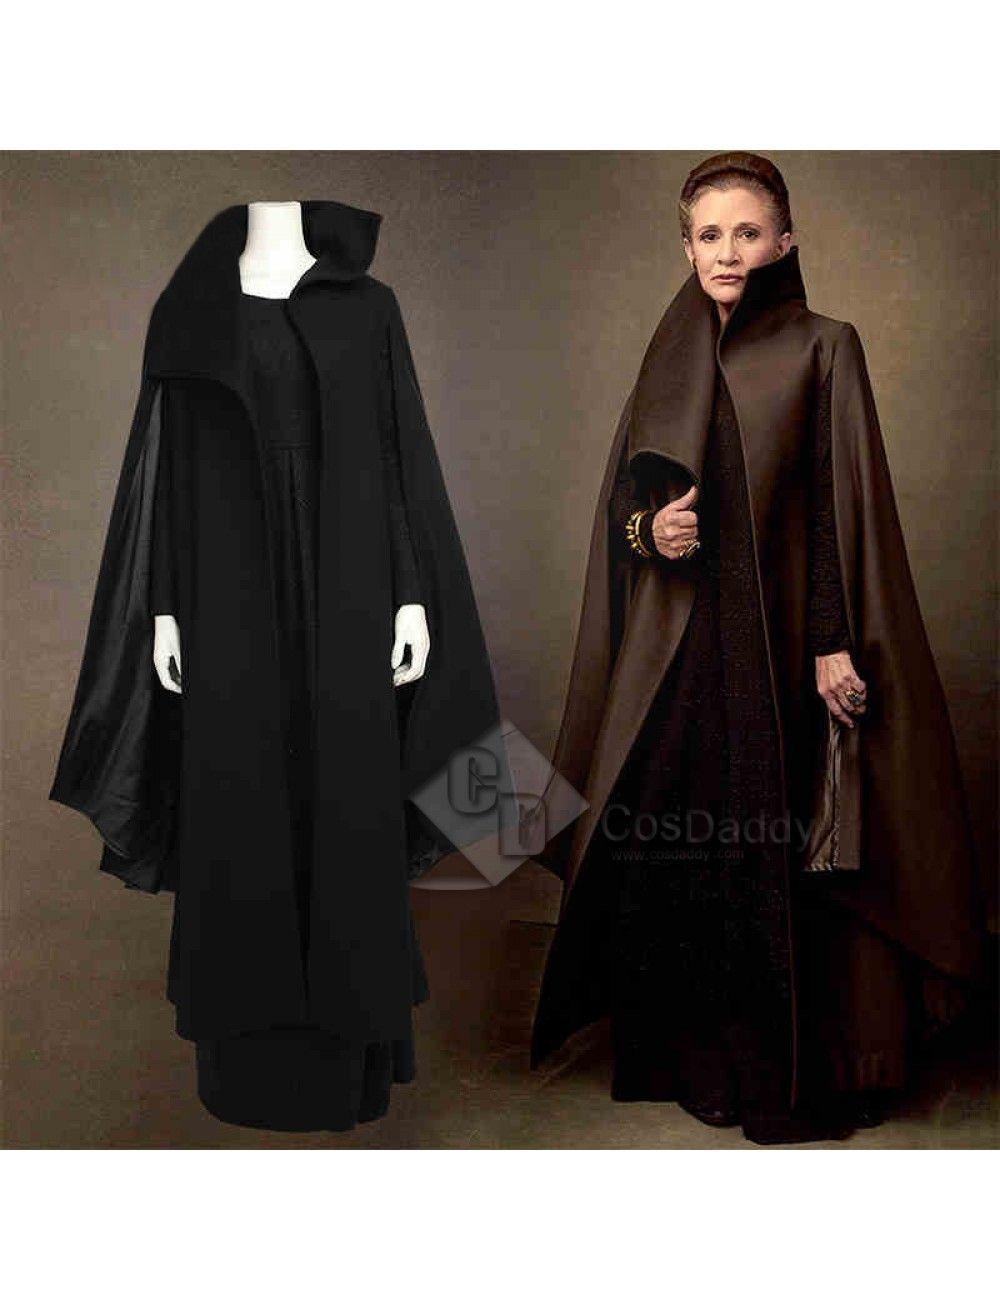 Star Wars Episode VIII The Last Jedi Princess Leia Organa Solo Cosplay Costume